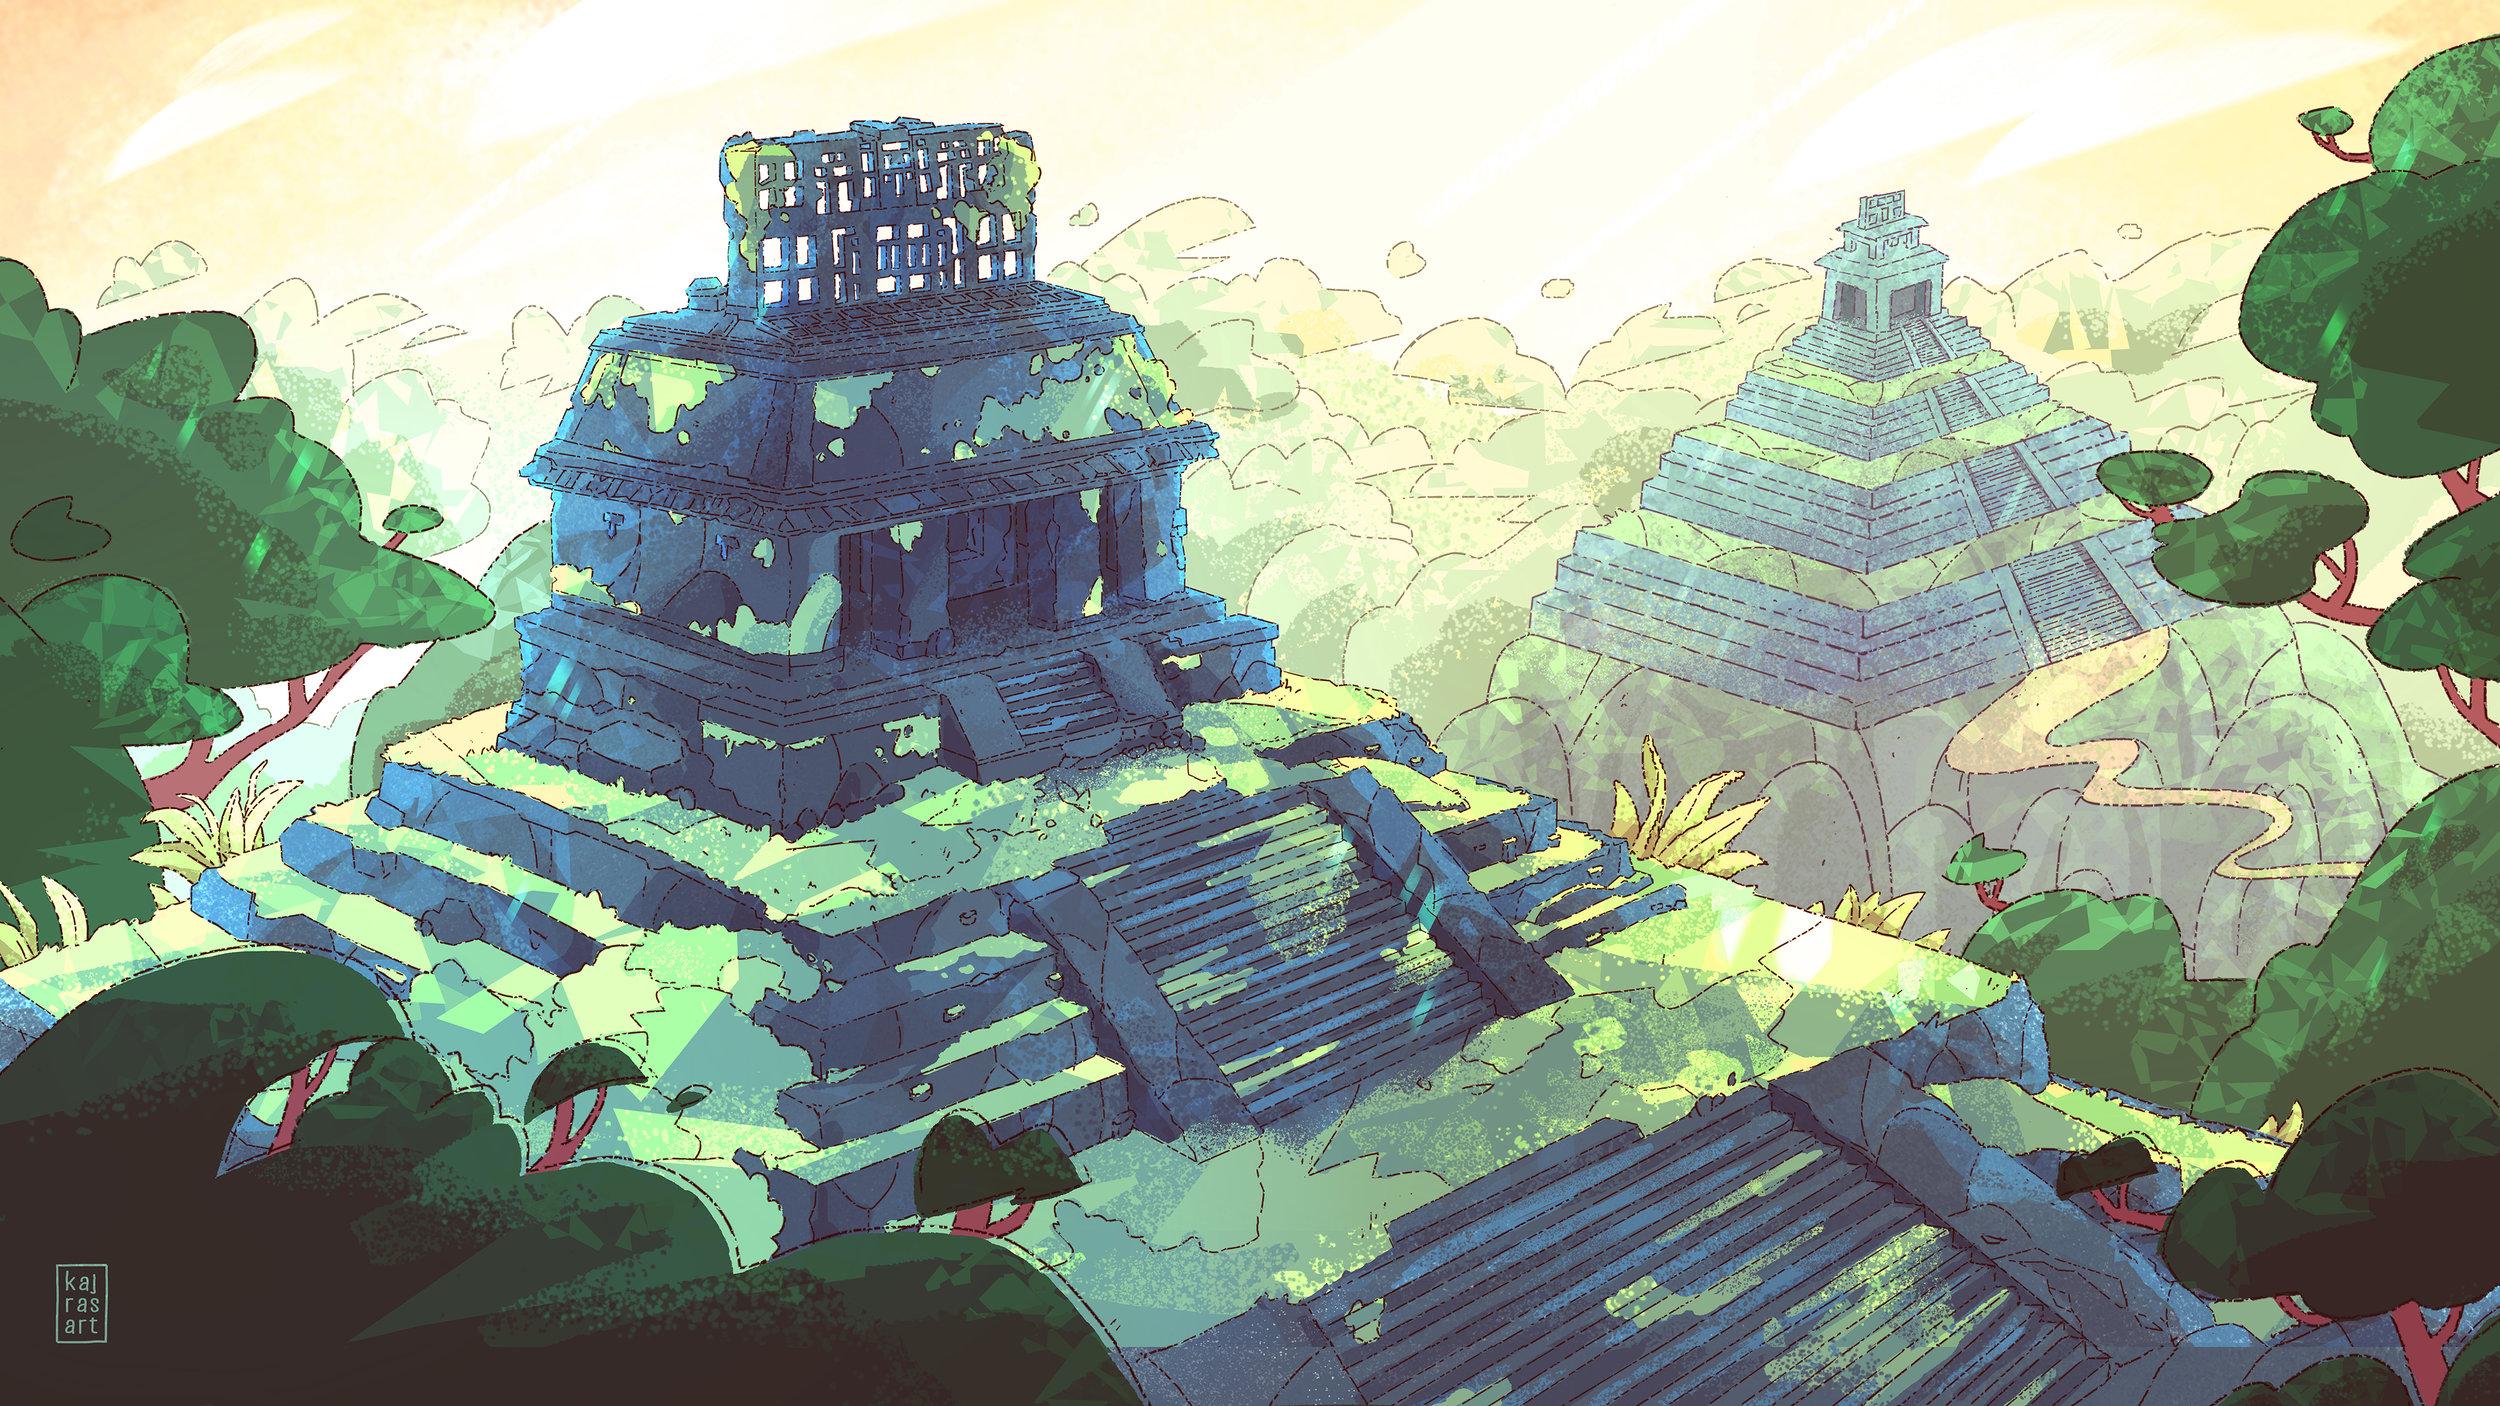 Aztec_temple_v03_small.jpg